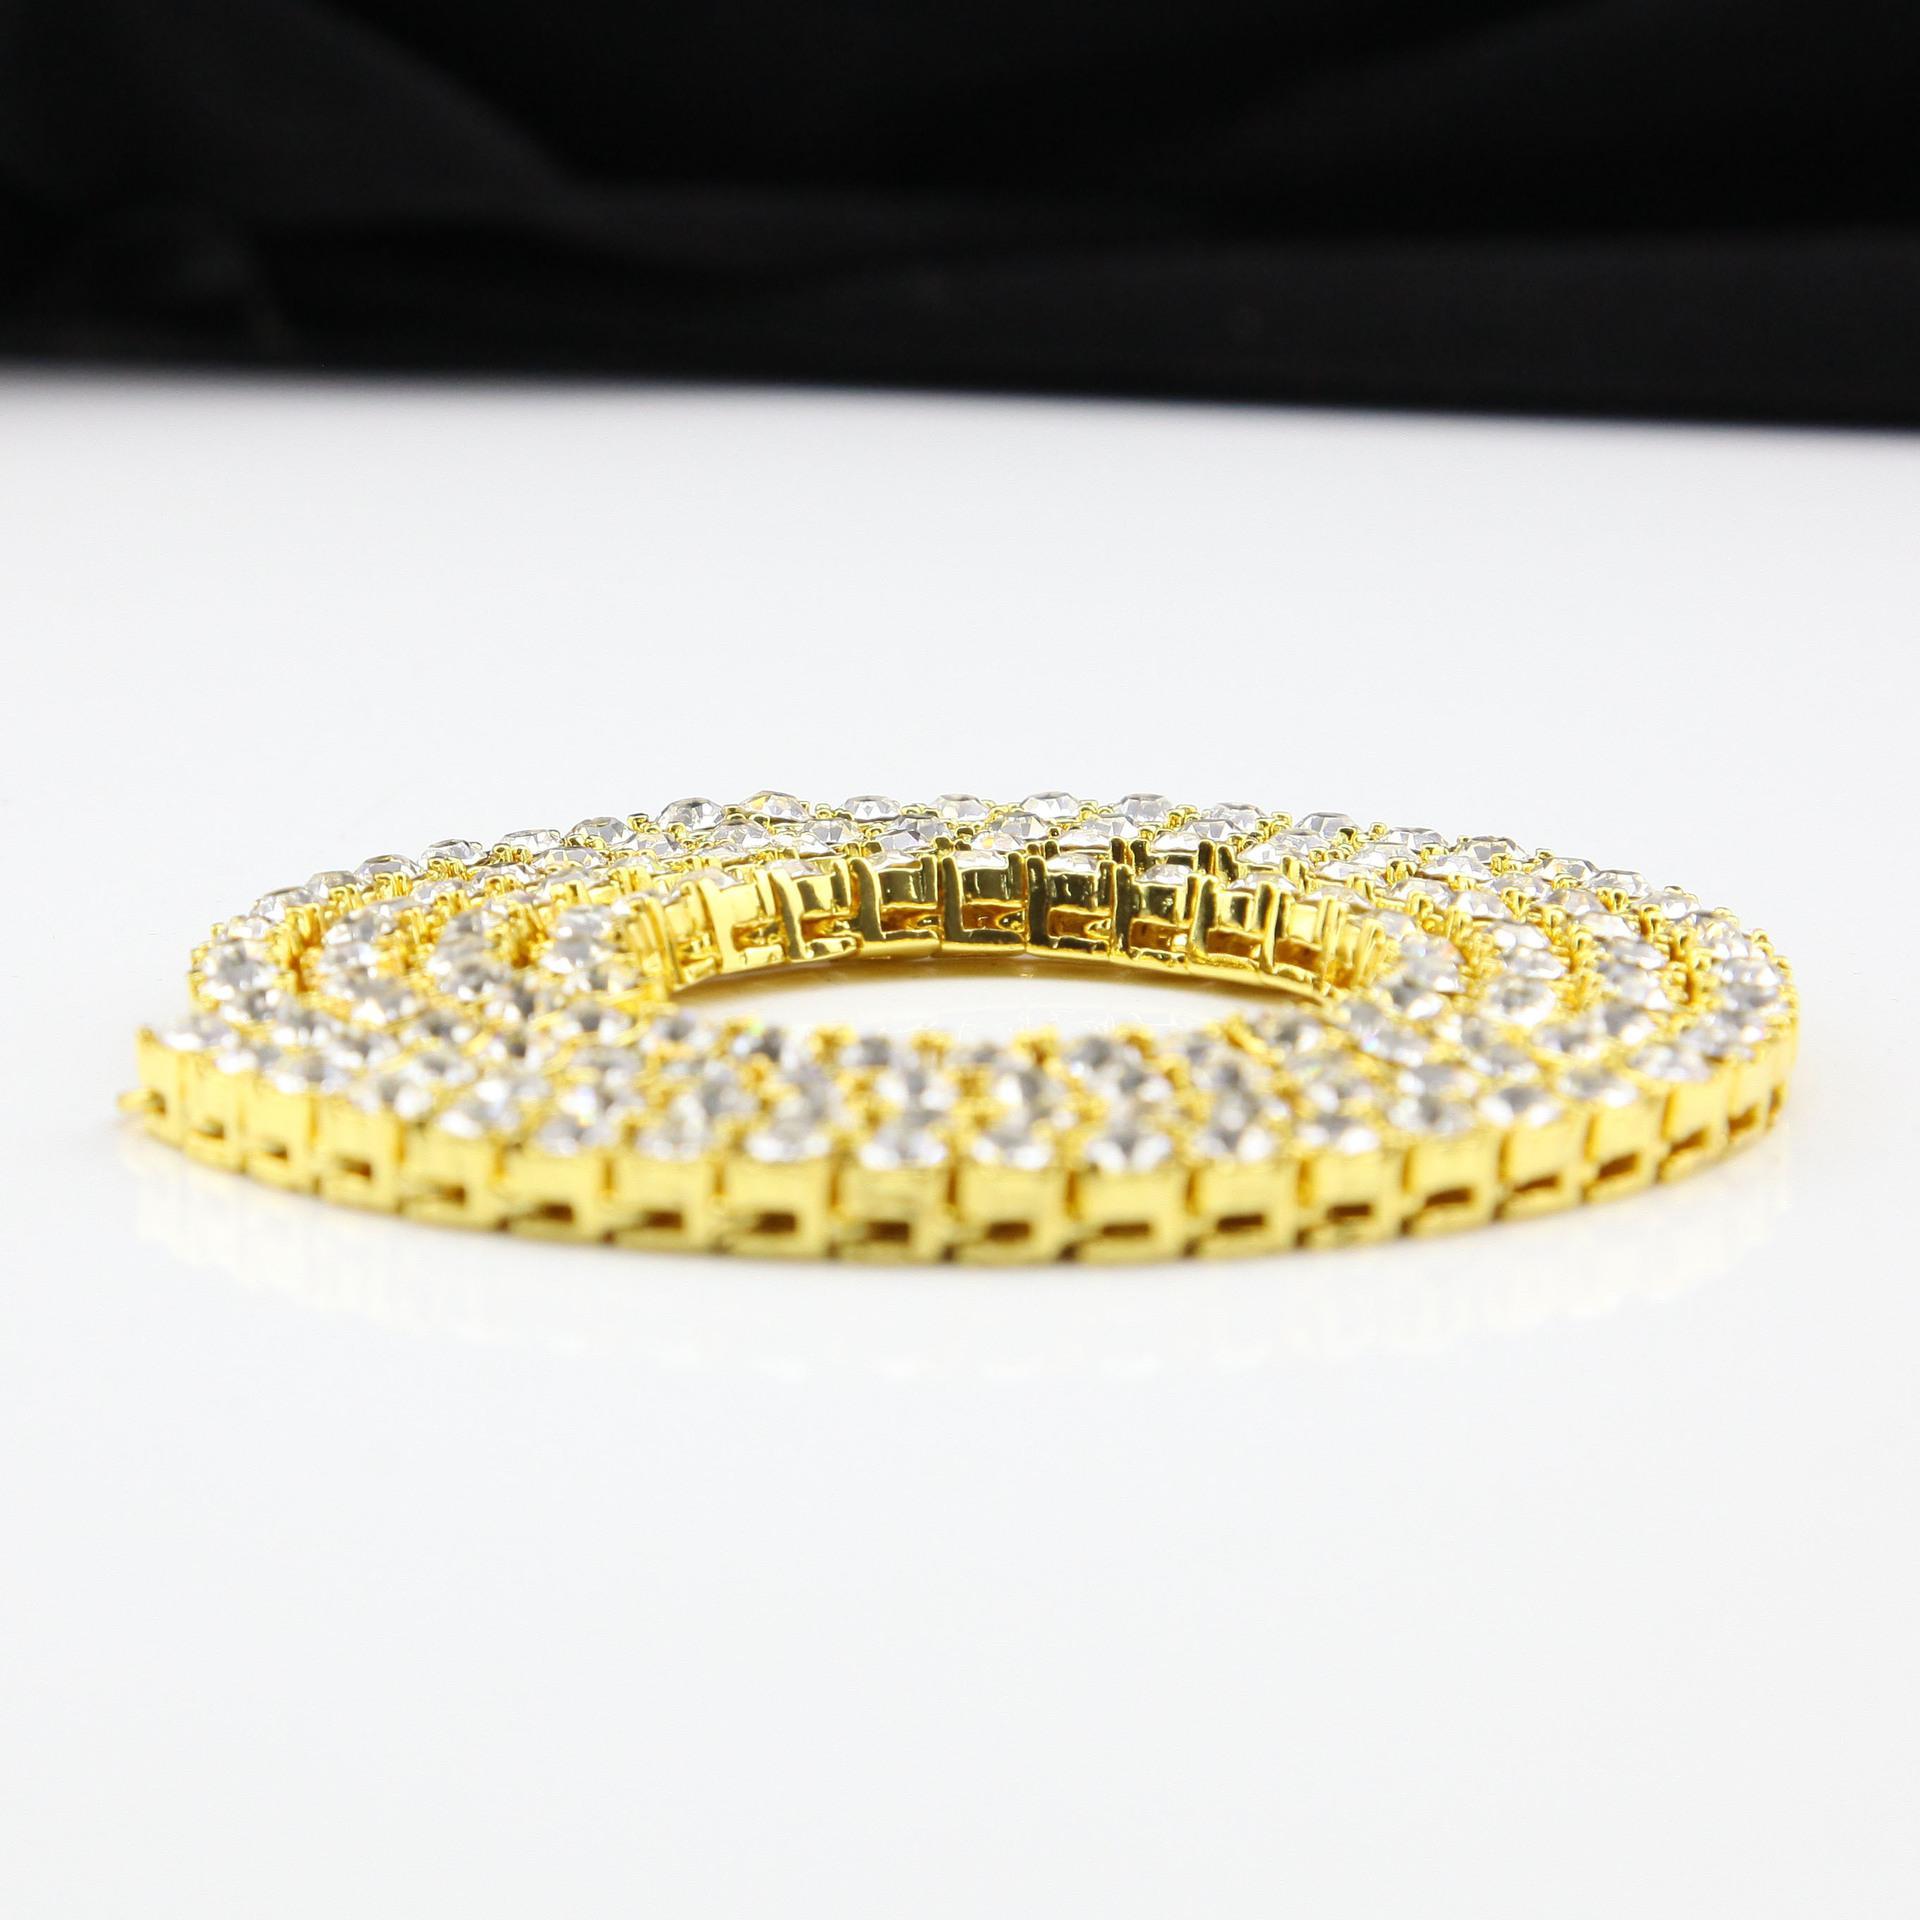 Goldkette Hip Hop Reihe simuliert Diamant Hip Hop Schmuck Halskette Kette 18-20-24-30 Zoll Herren Gold Tone Iced Out Ketten Halsketten